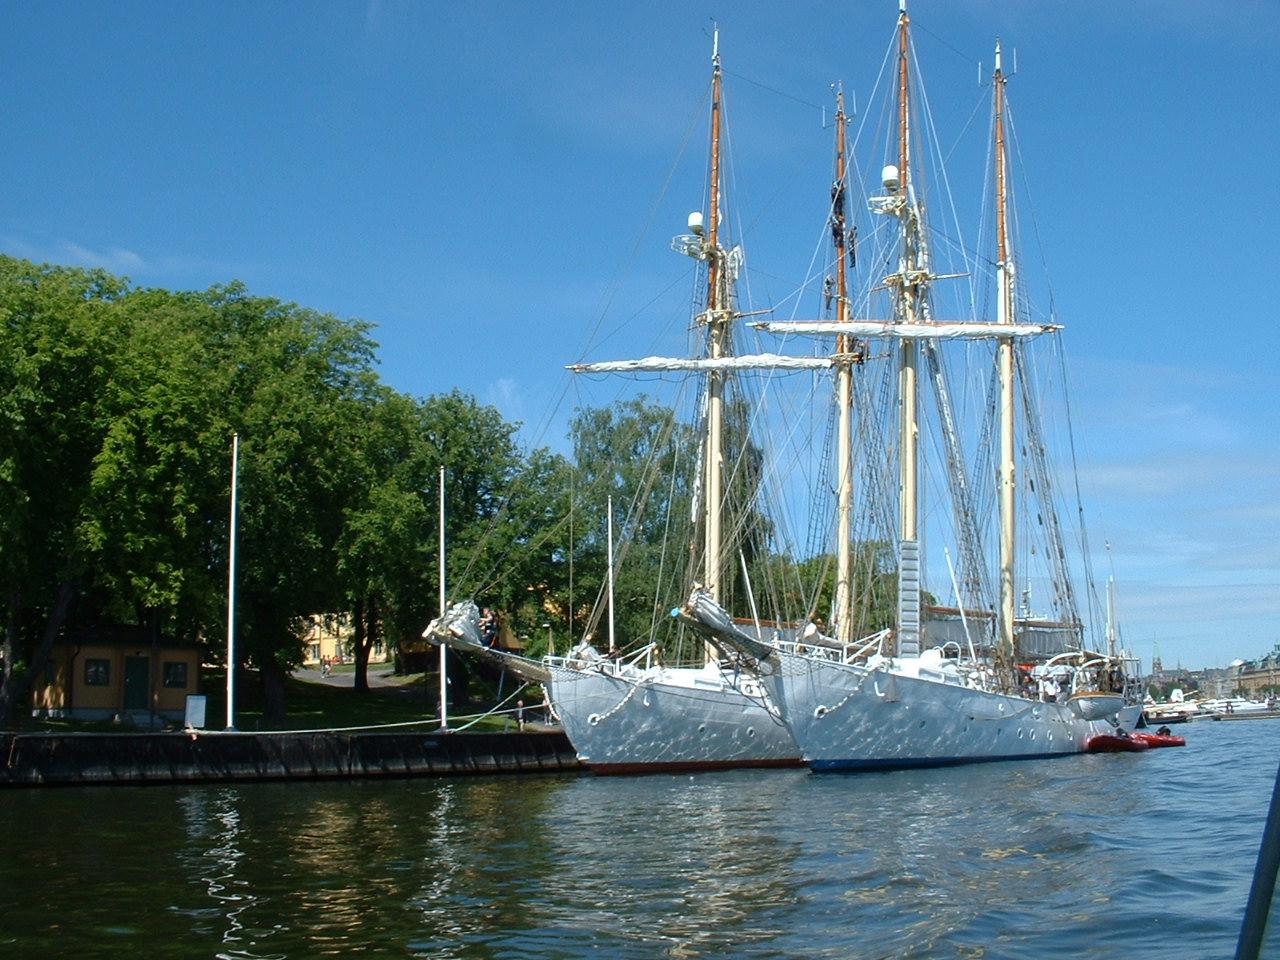 Sailing ships - Stockholm